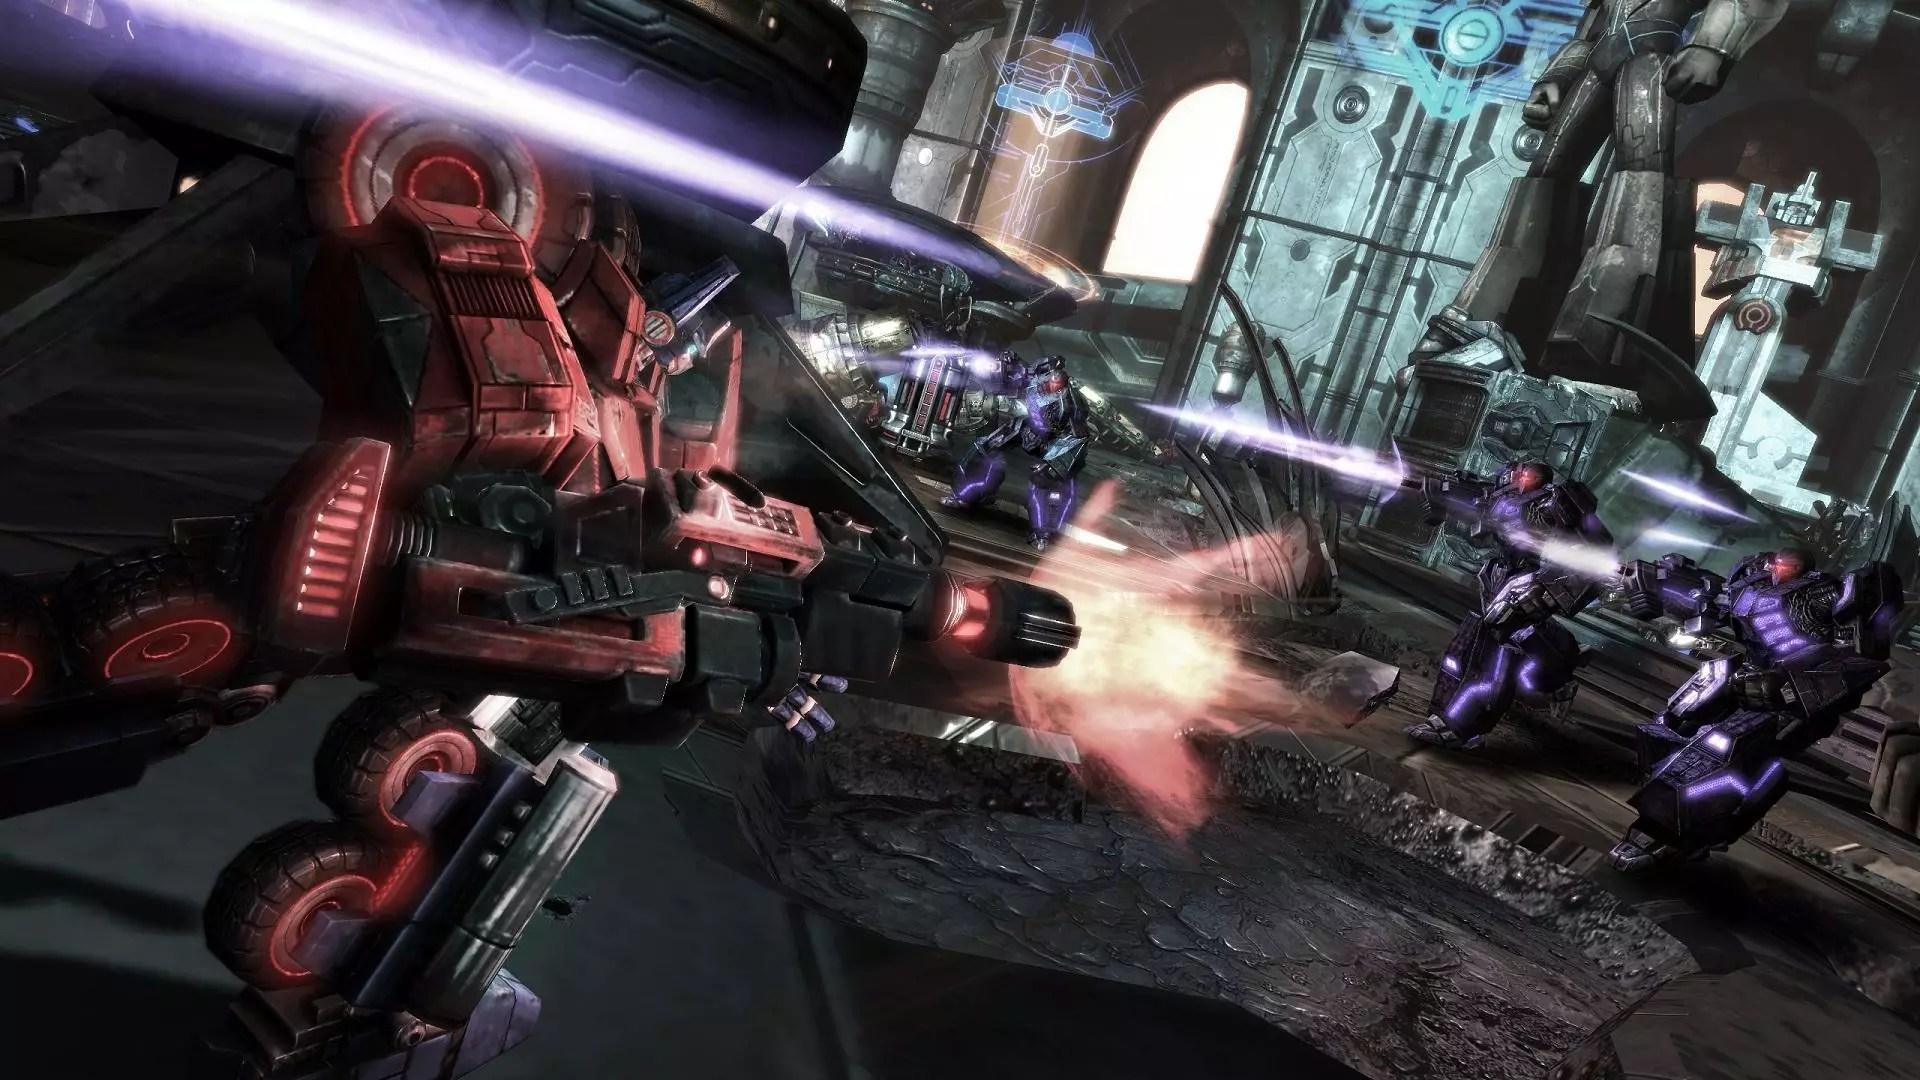 Transformers Fall Of Cybertron Wallpaper Hd Transformers War For Cybertron Download